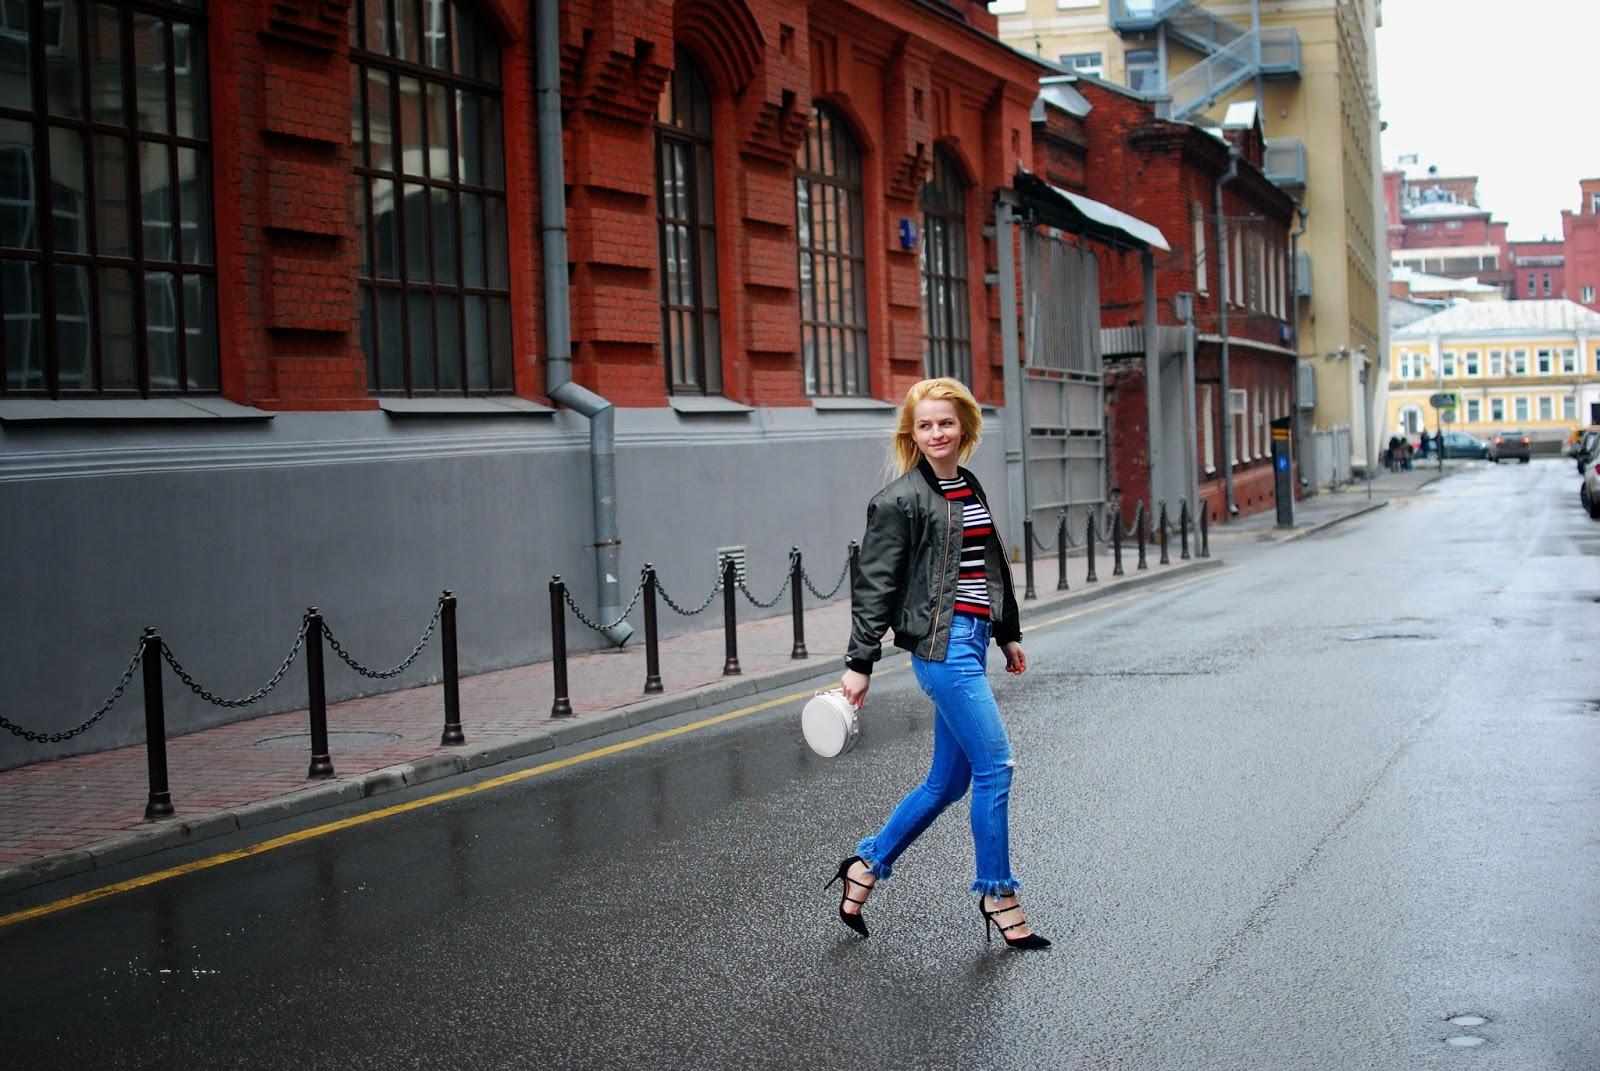 costa de la moda, stripe jumper outfit, raw hem jeans ideas, рваные джинсы тренд весна, уличная мода весна 2016